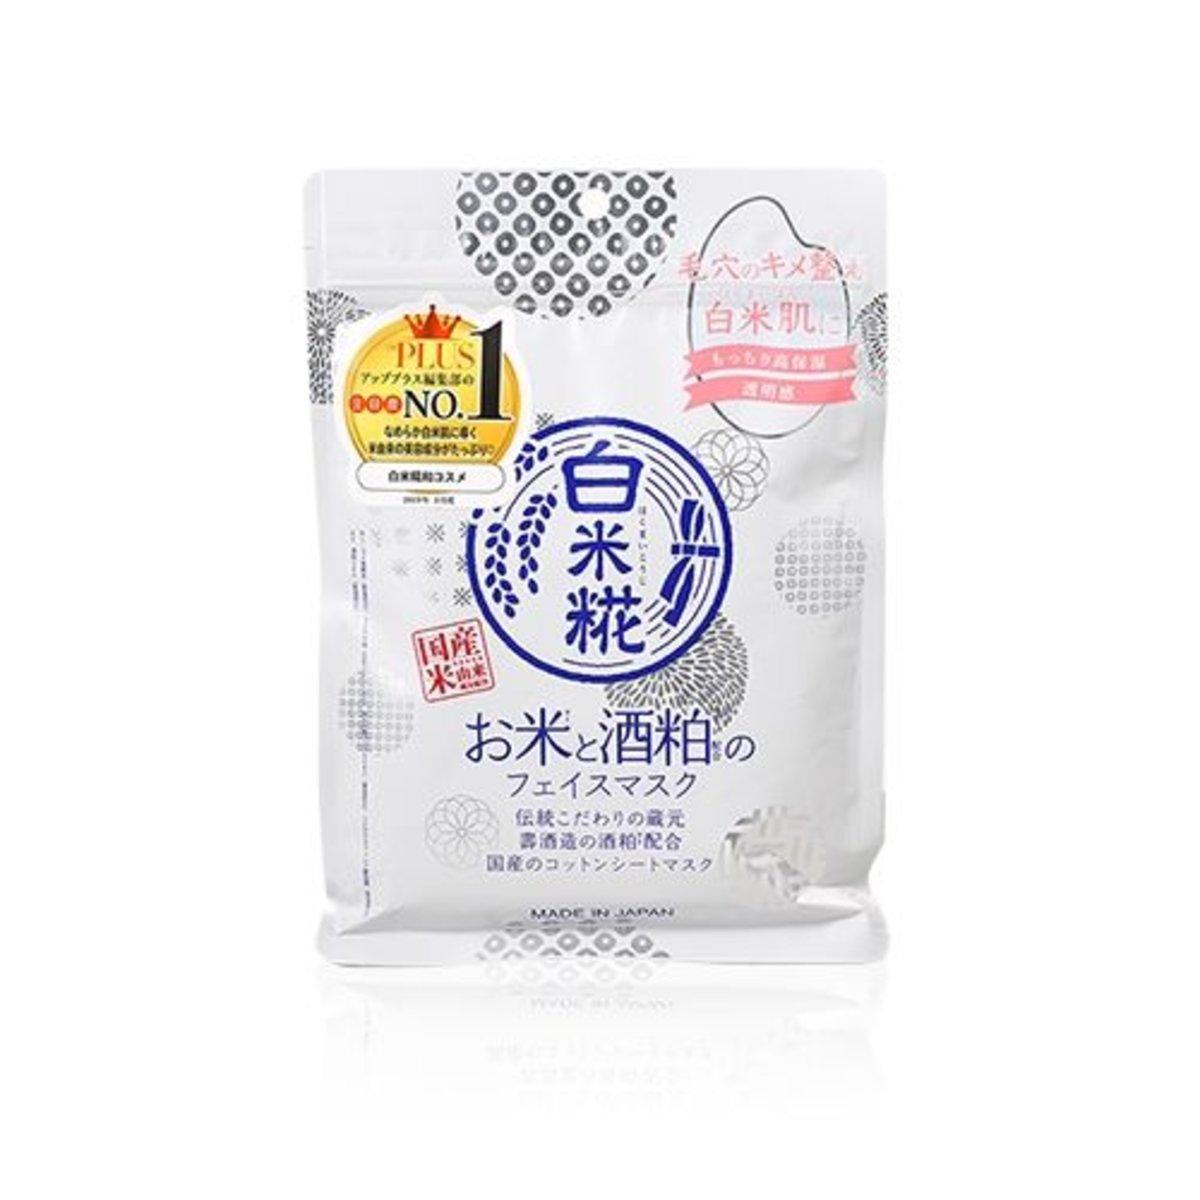 White Rice Sauce Face Mask